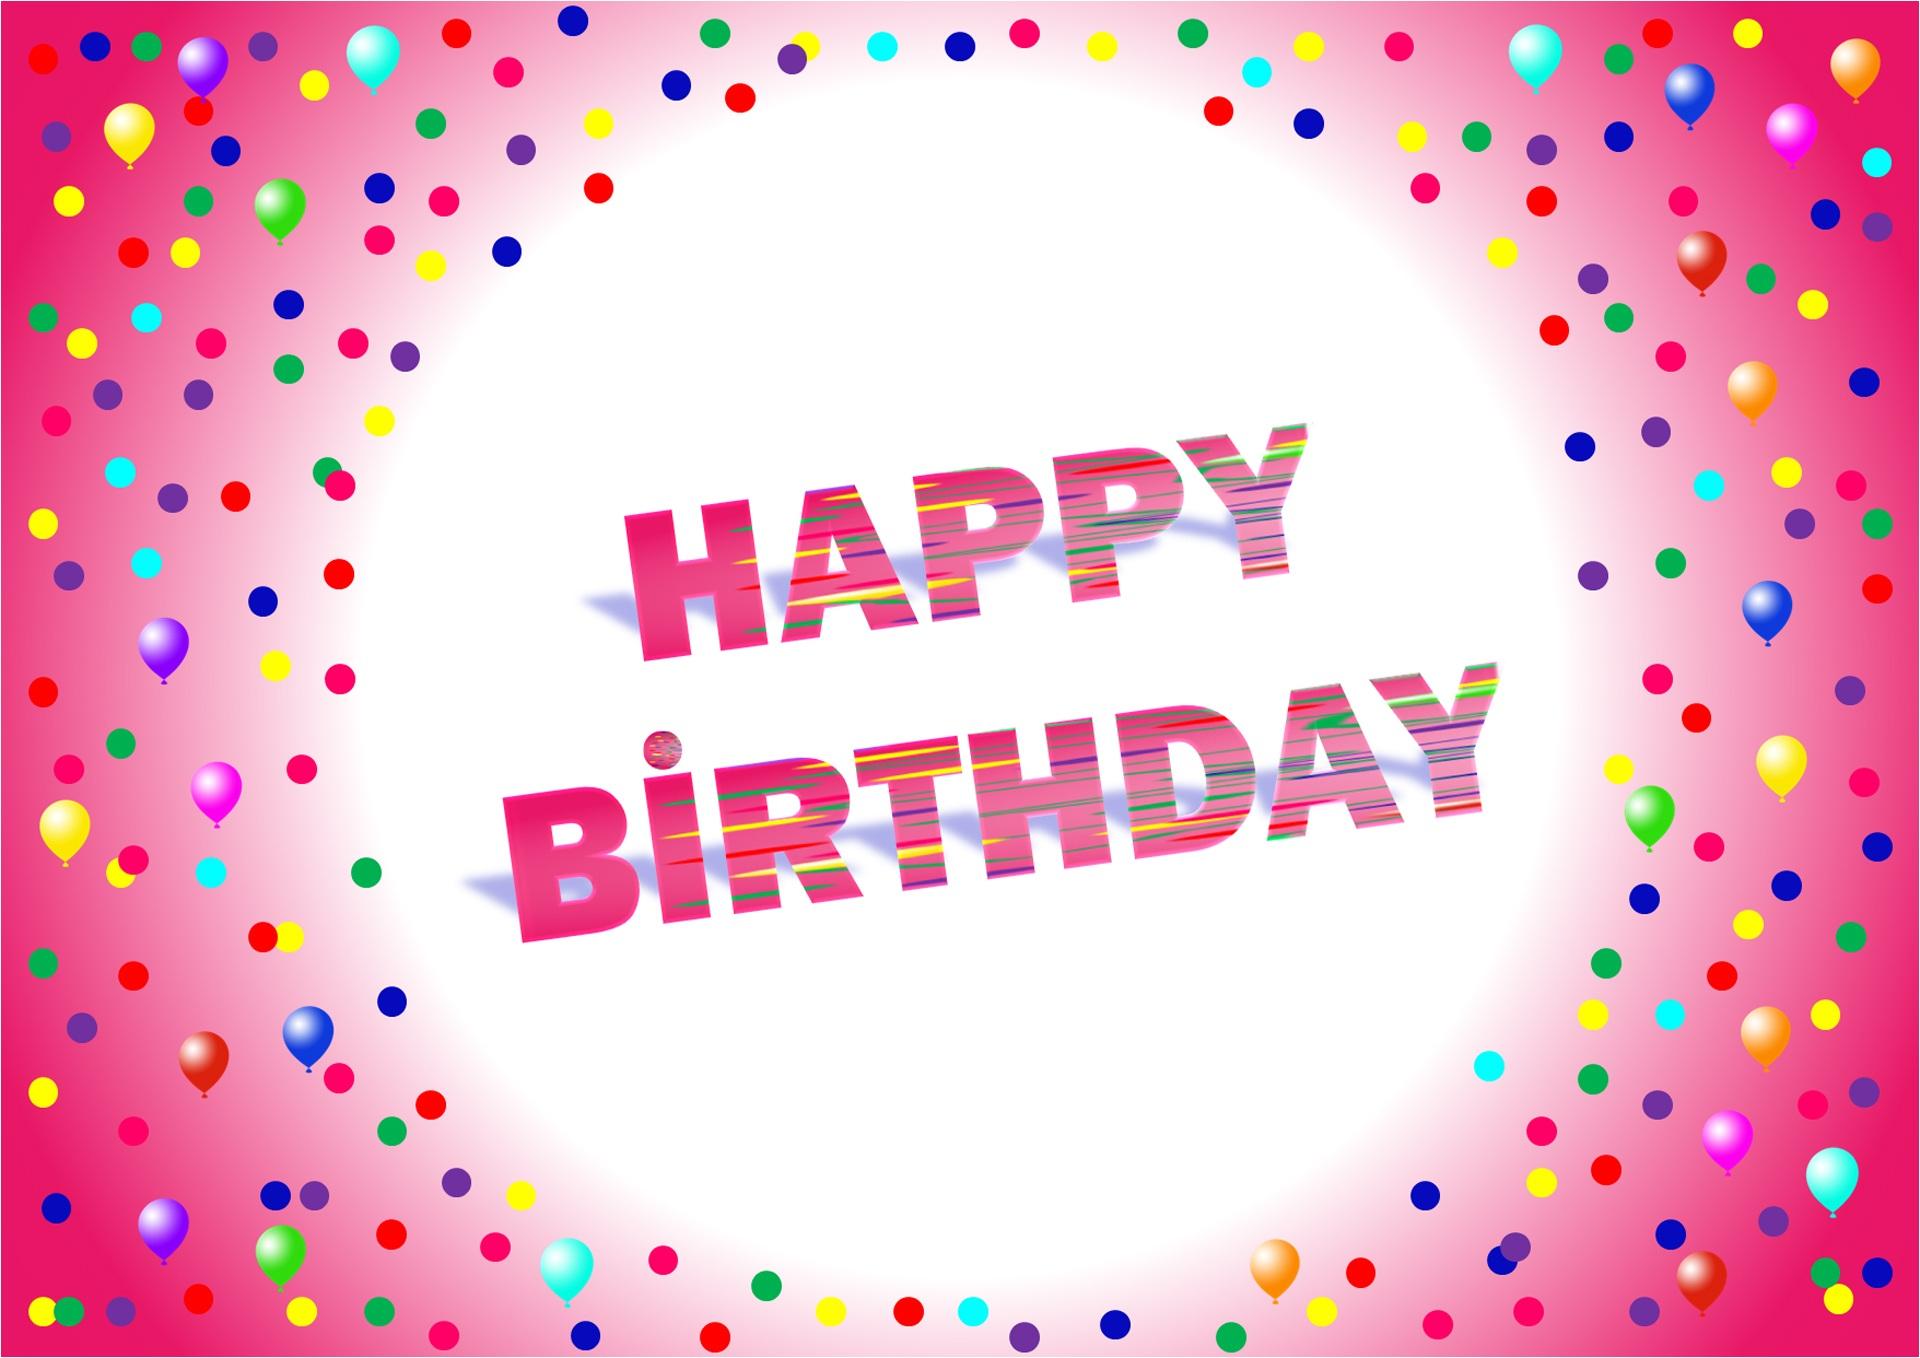 Birthday Party Invitation Wording 40thbirthdaysayings Org